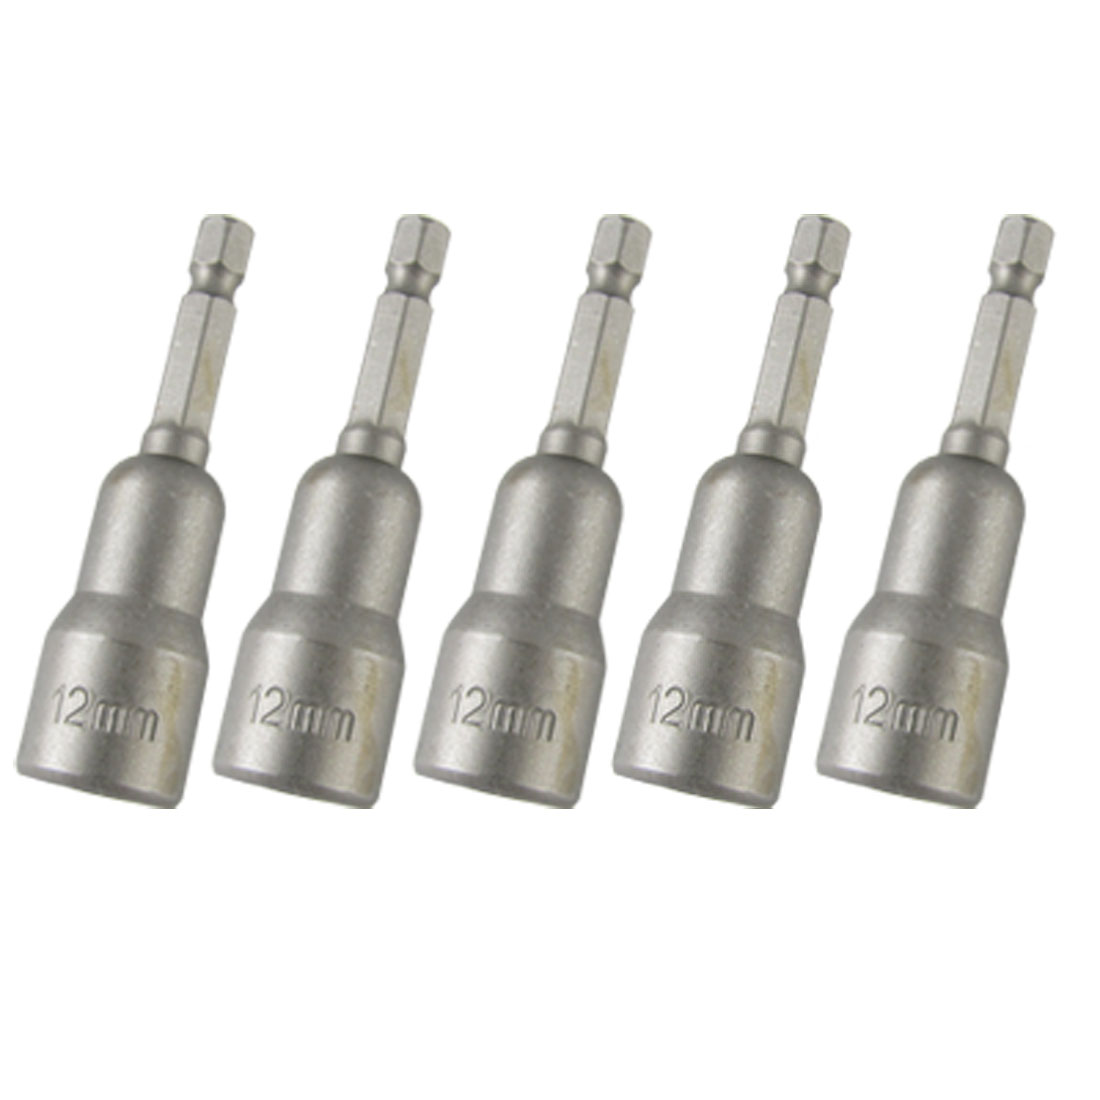 5 Pieces 12 x 65mm Nut Setter Driver Hex Socket Bits Kit